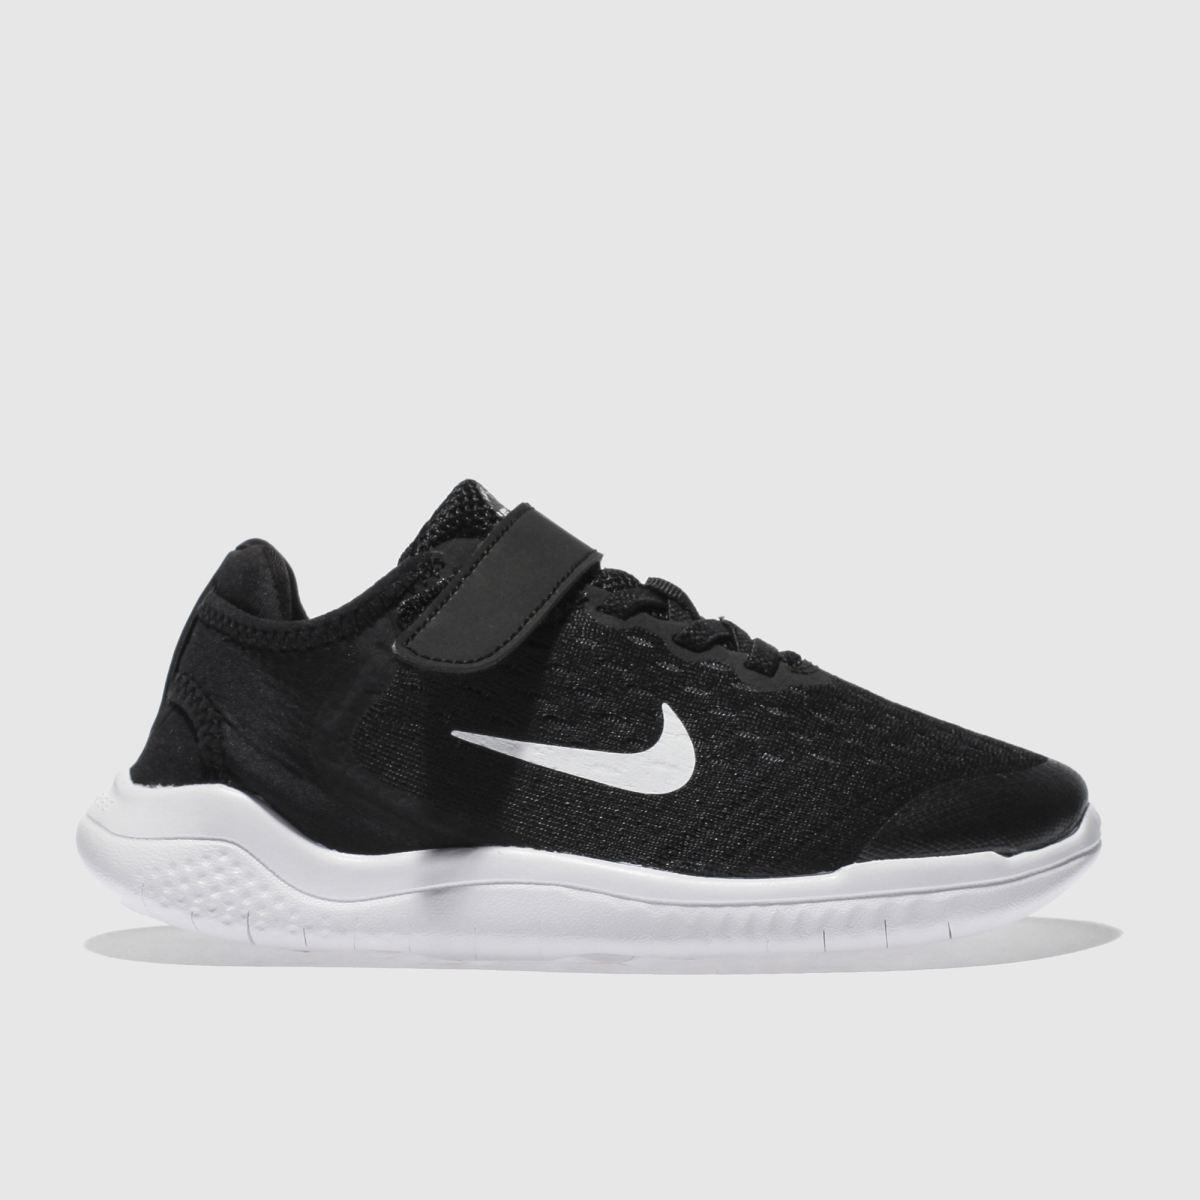 Nike Black & White Free Rn 2018 Trainers Junior